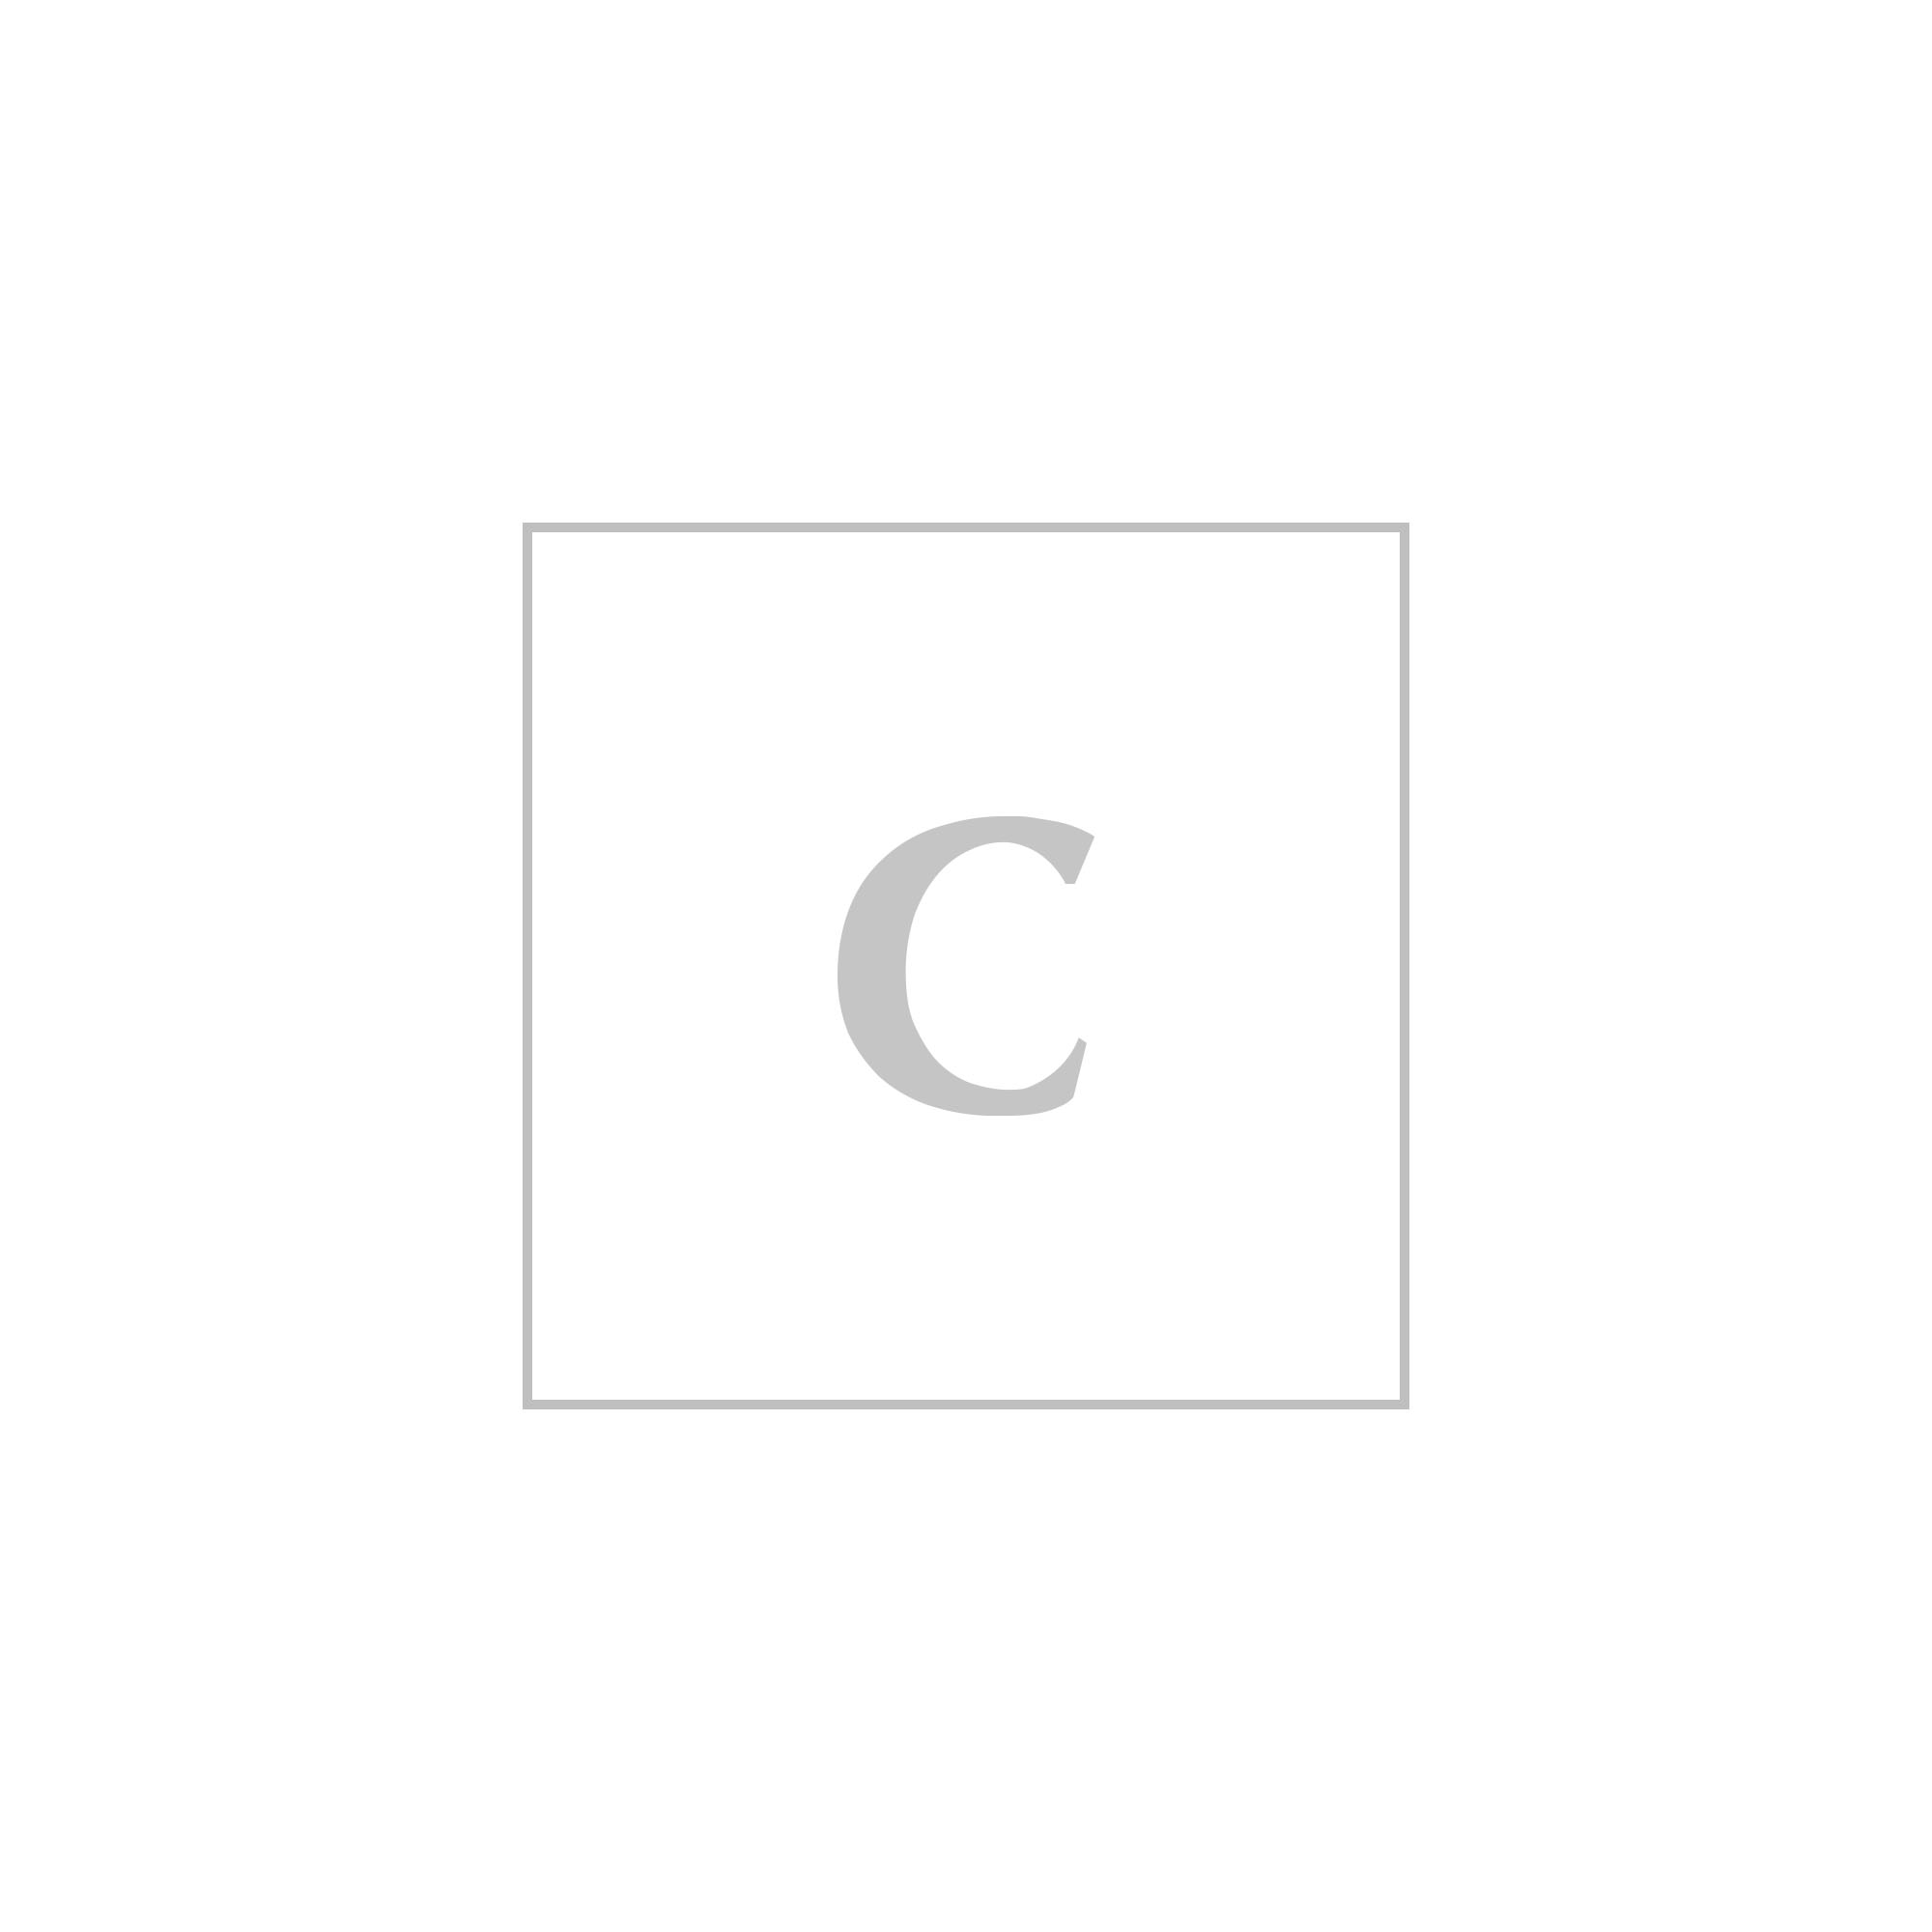 Saint laurent ysl borsa monogramme